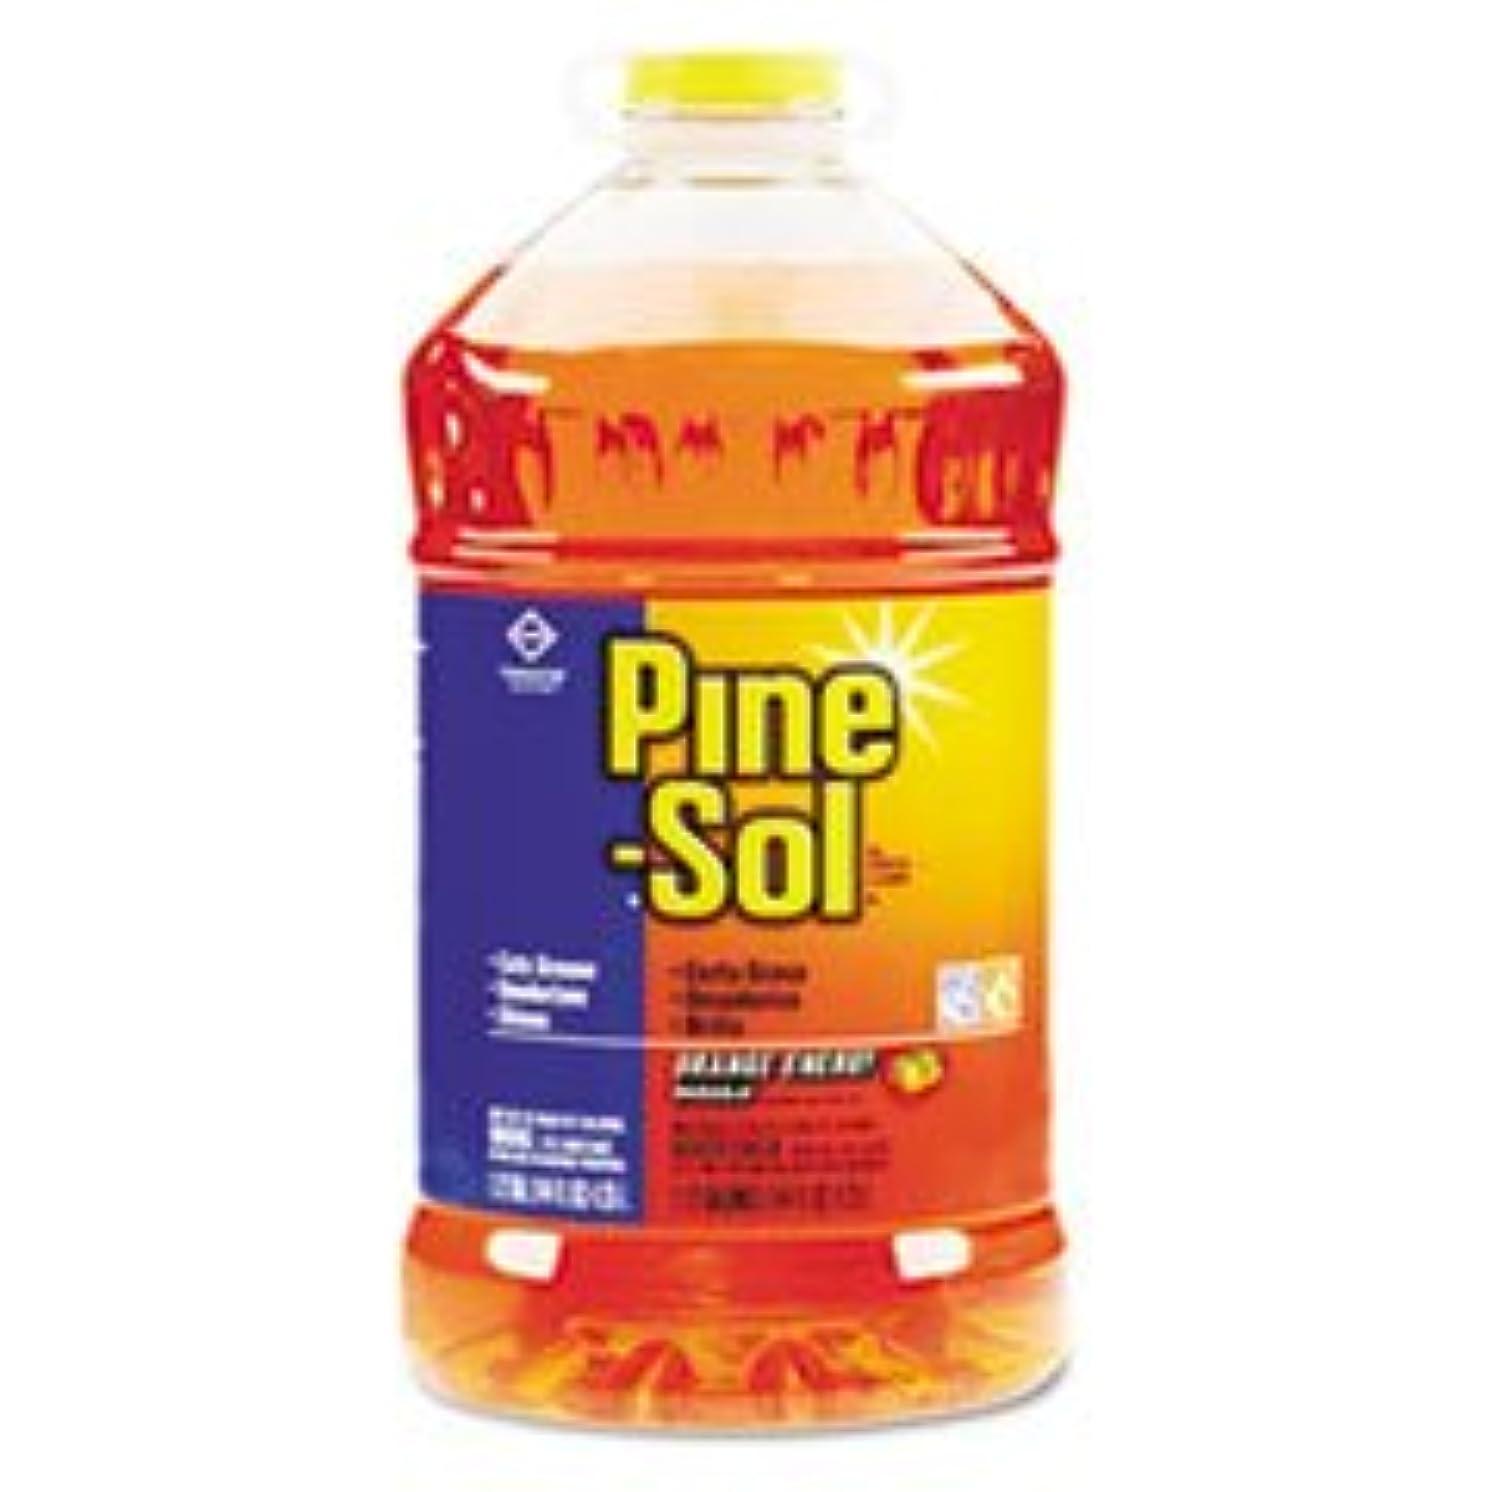 Pine-Sol All-Purpose Cleaner, Orange Scent, 144oz. Bottle, 3/carton